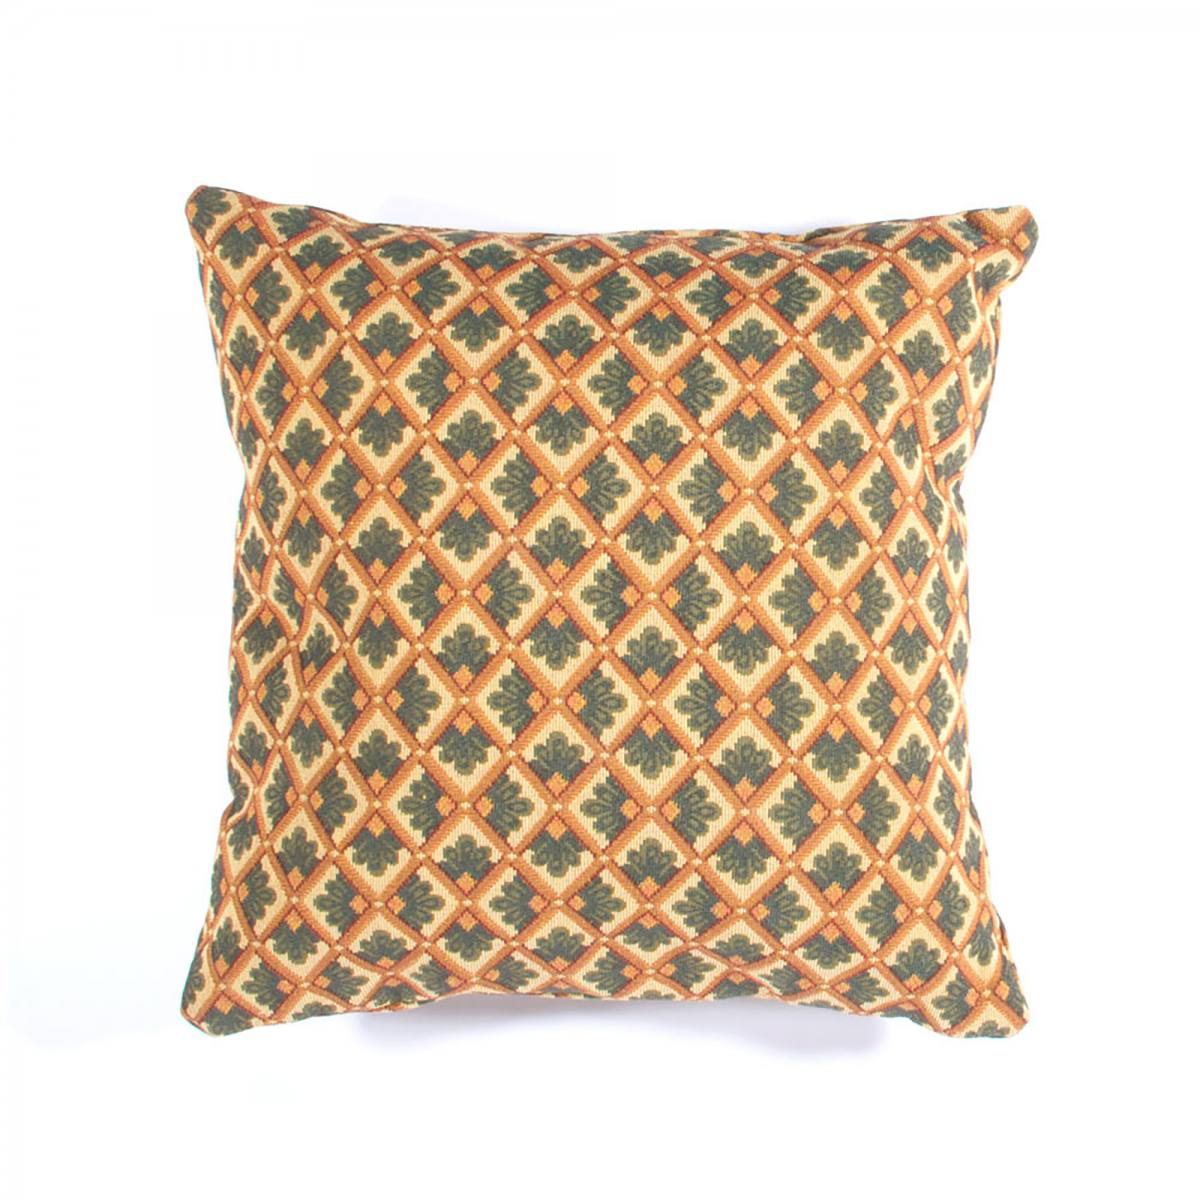 02-20140503-pillow-02